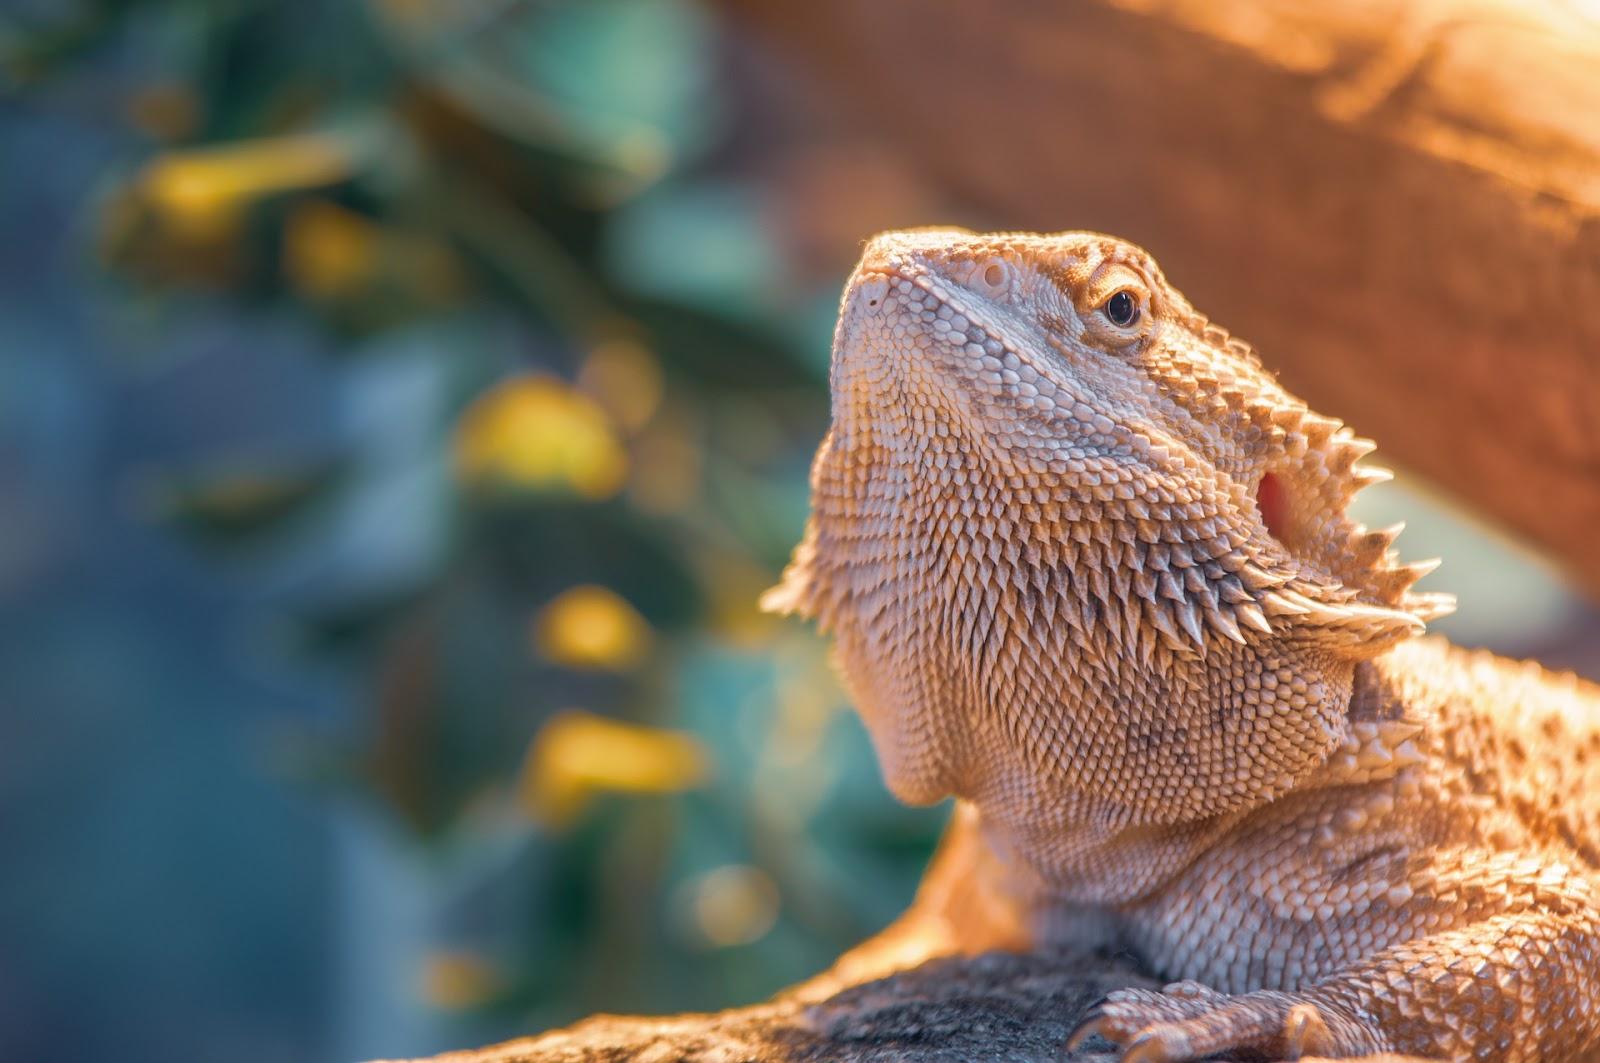 Bearded dragon basking